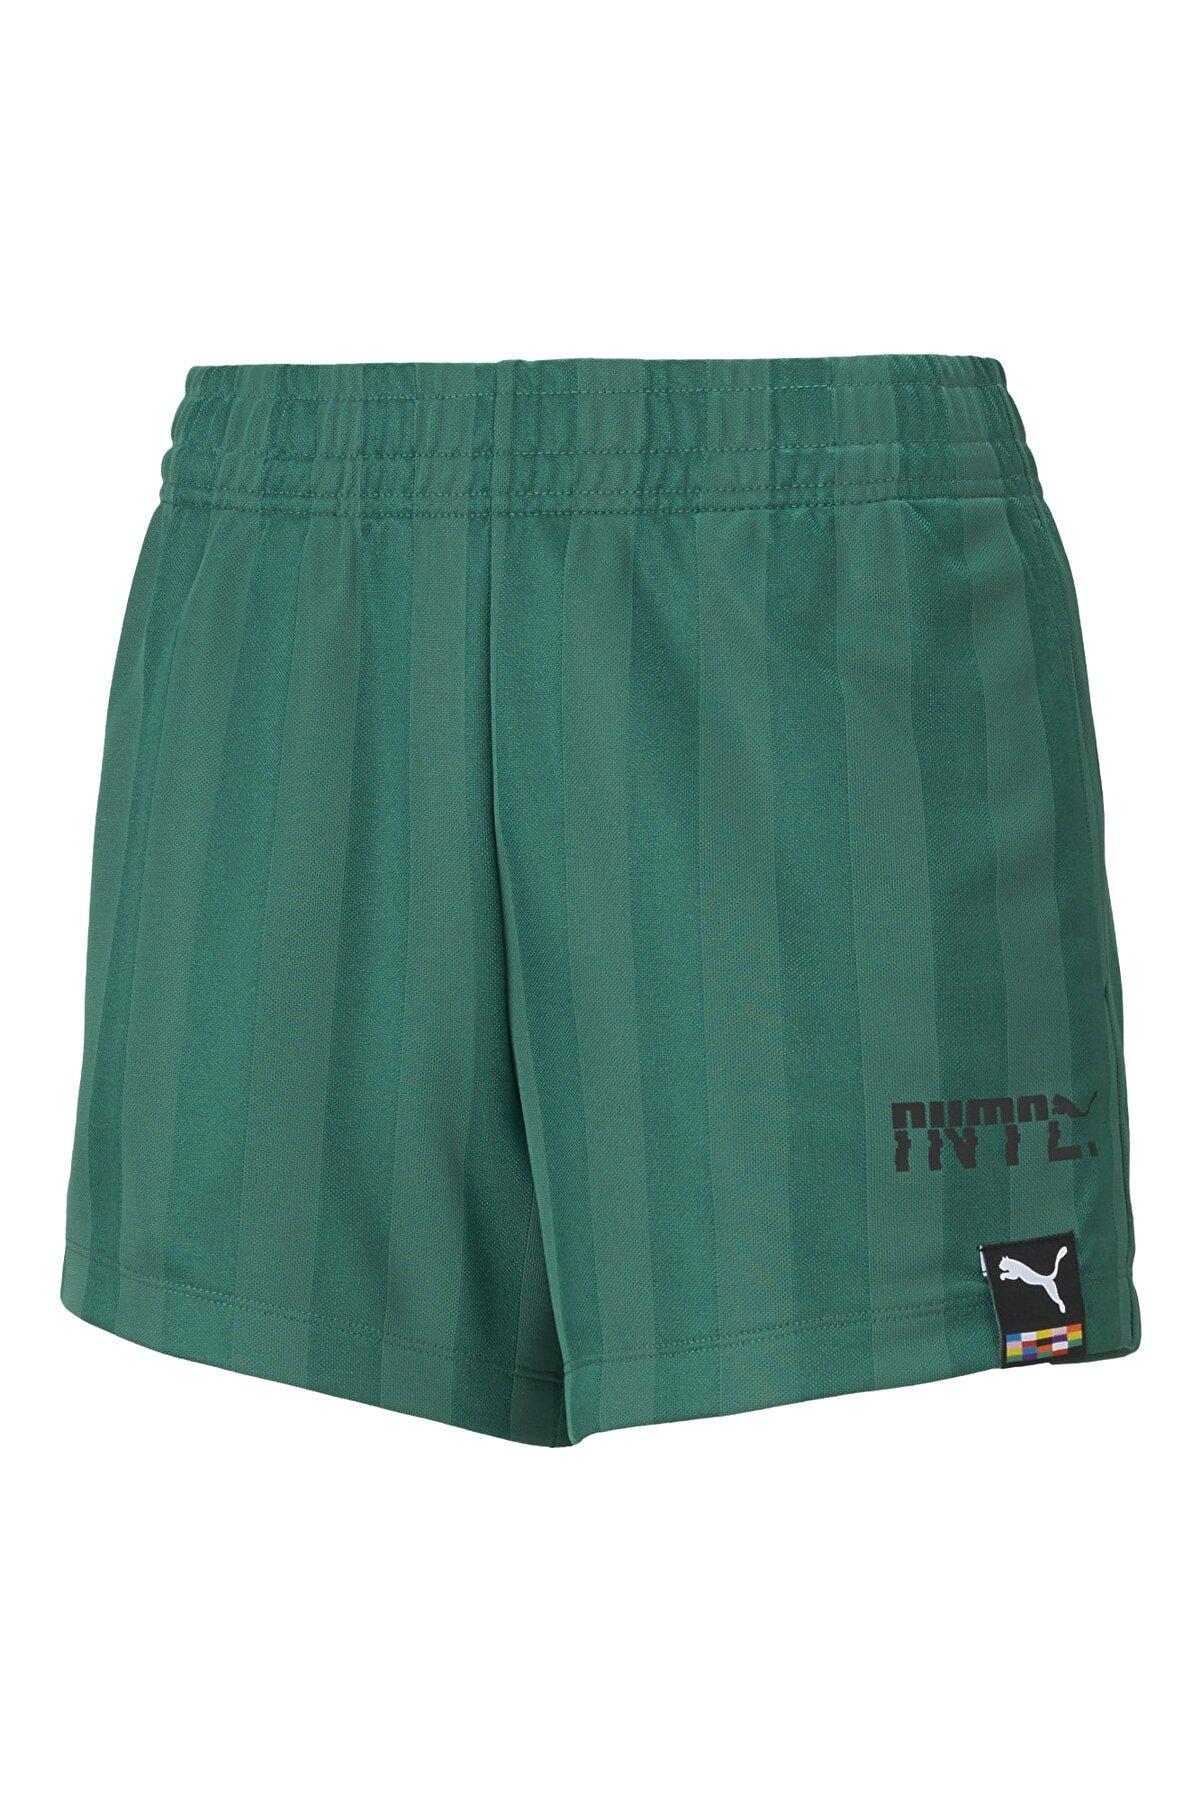 Puma Kadın Spor Şort - PI Poly Jersey - 59971345